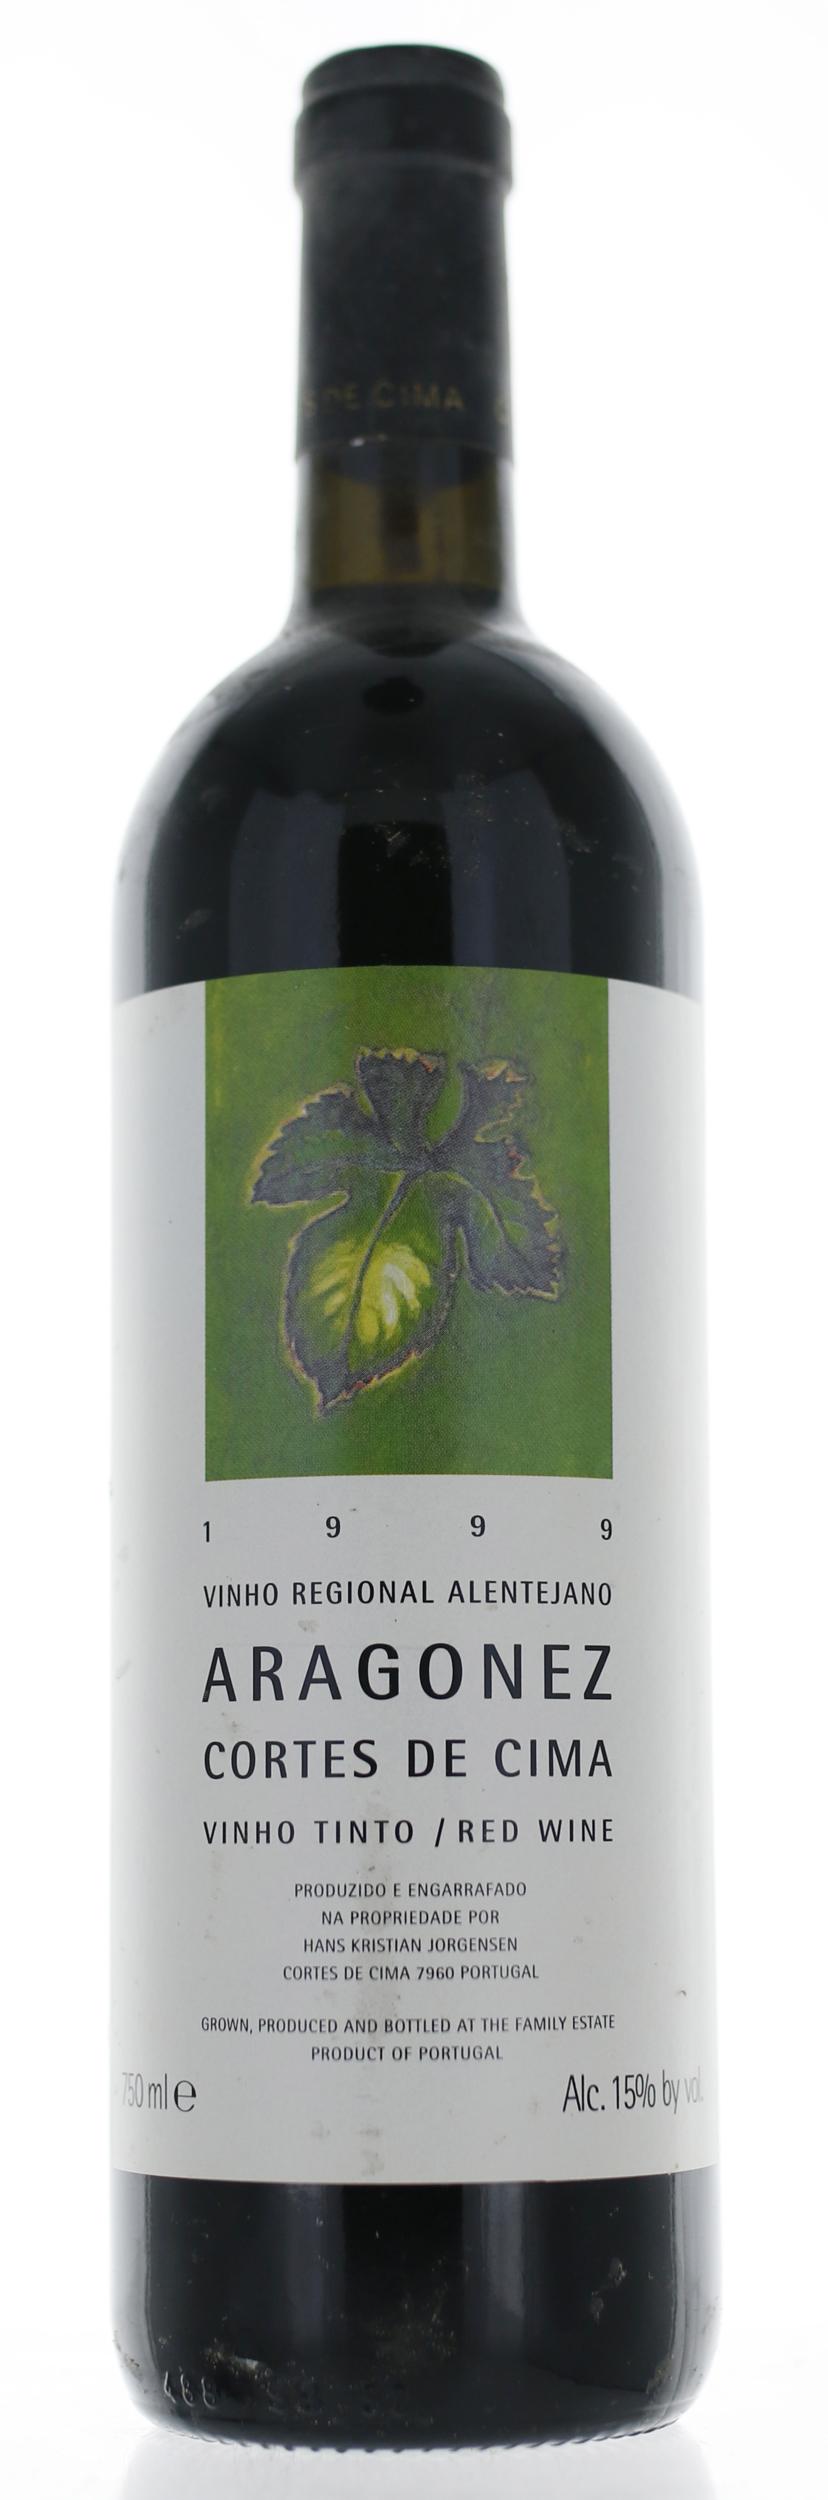 Aragonez Cortes de Cima - 1999